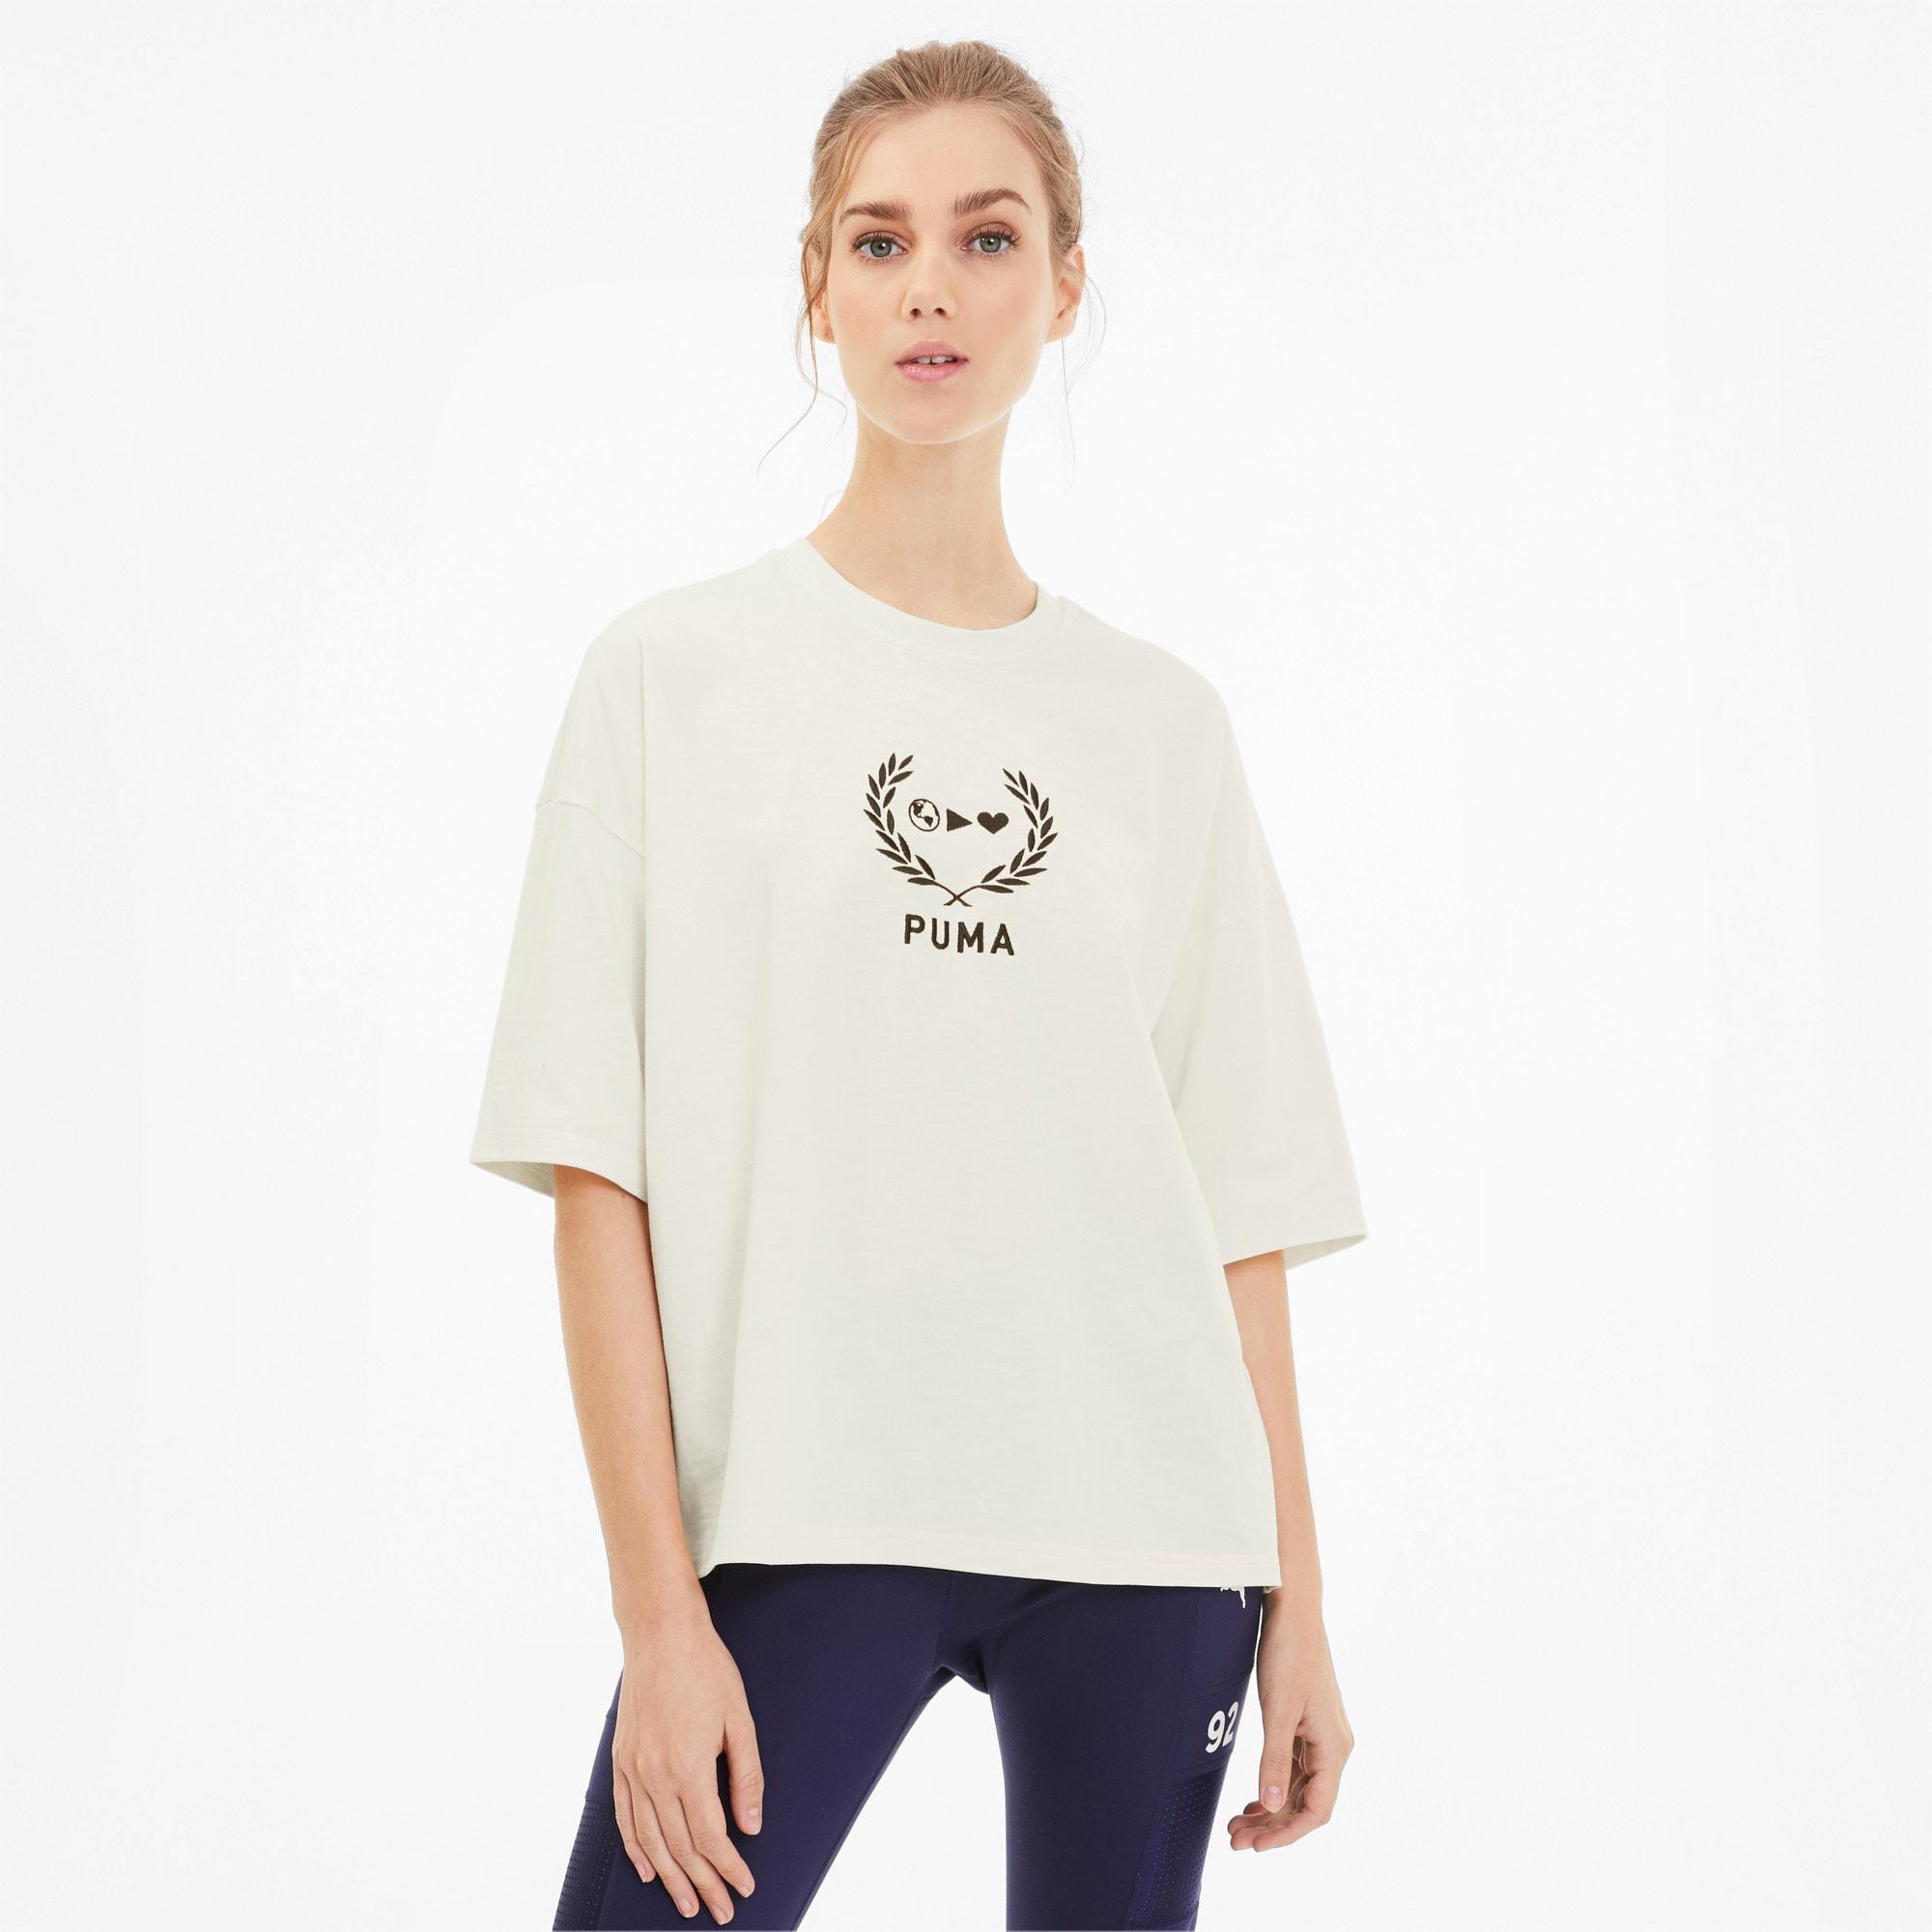 PUMA x SELENA GOMEZ Oversized T shirt til kvinder